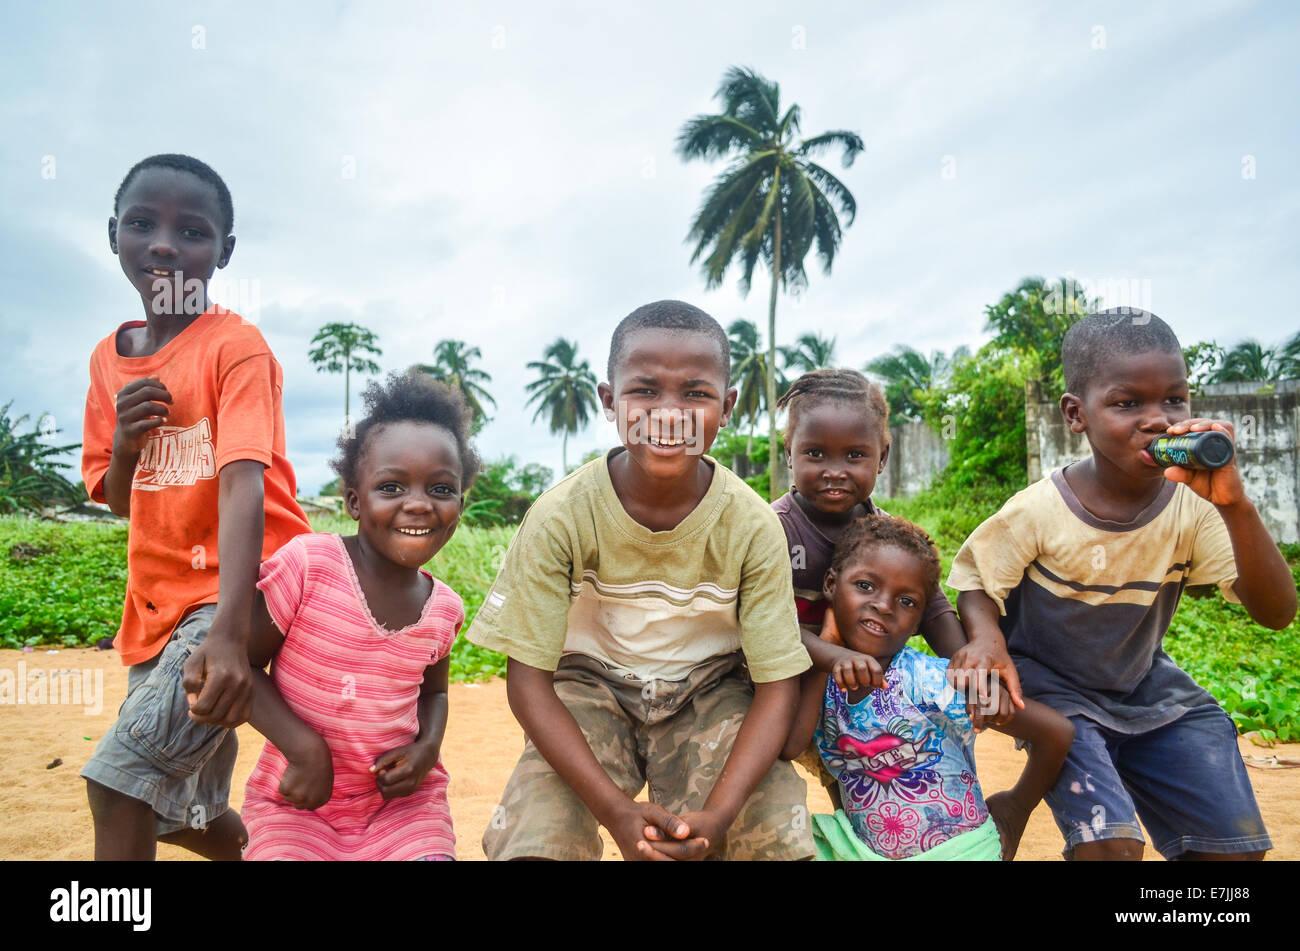 African children posing in Liberia Stock Photo